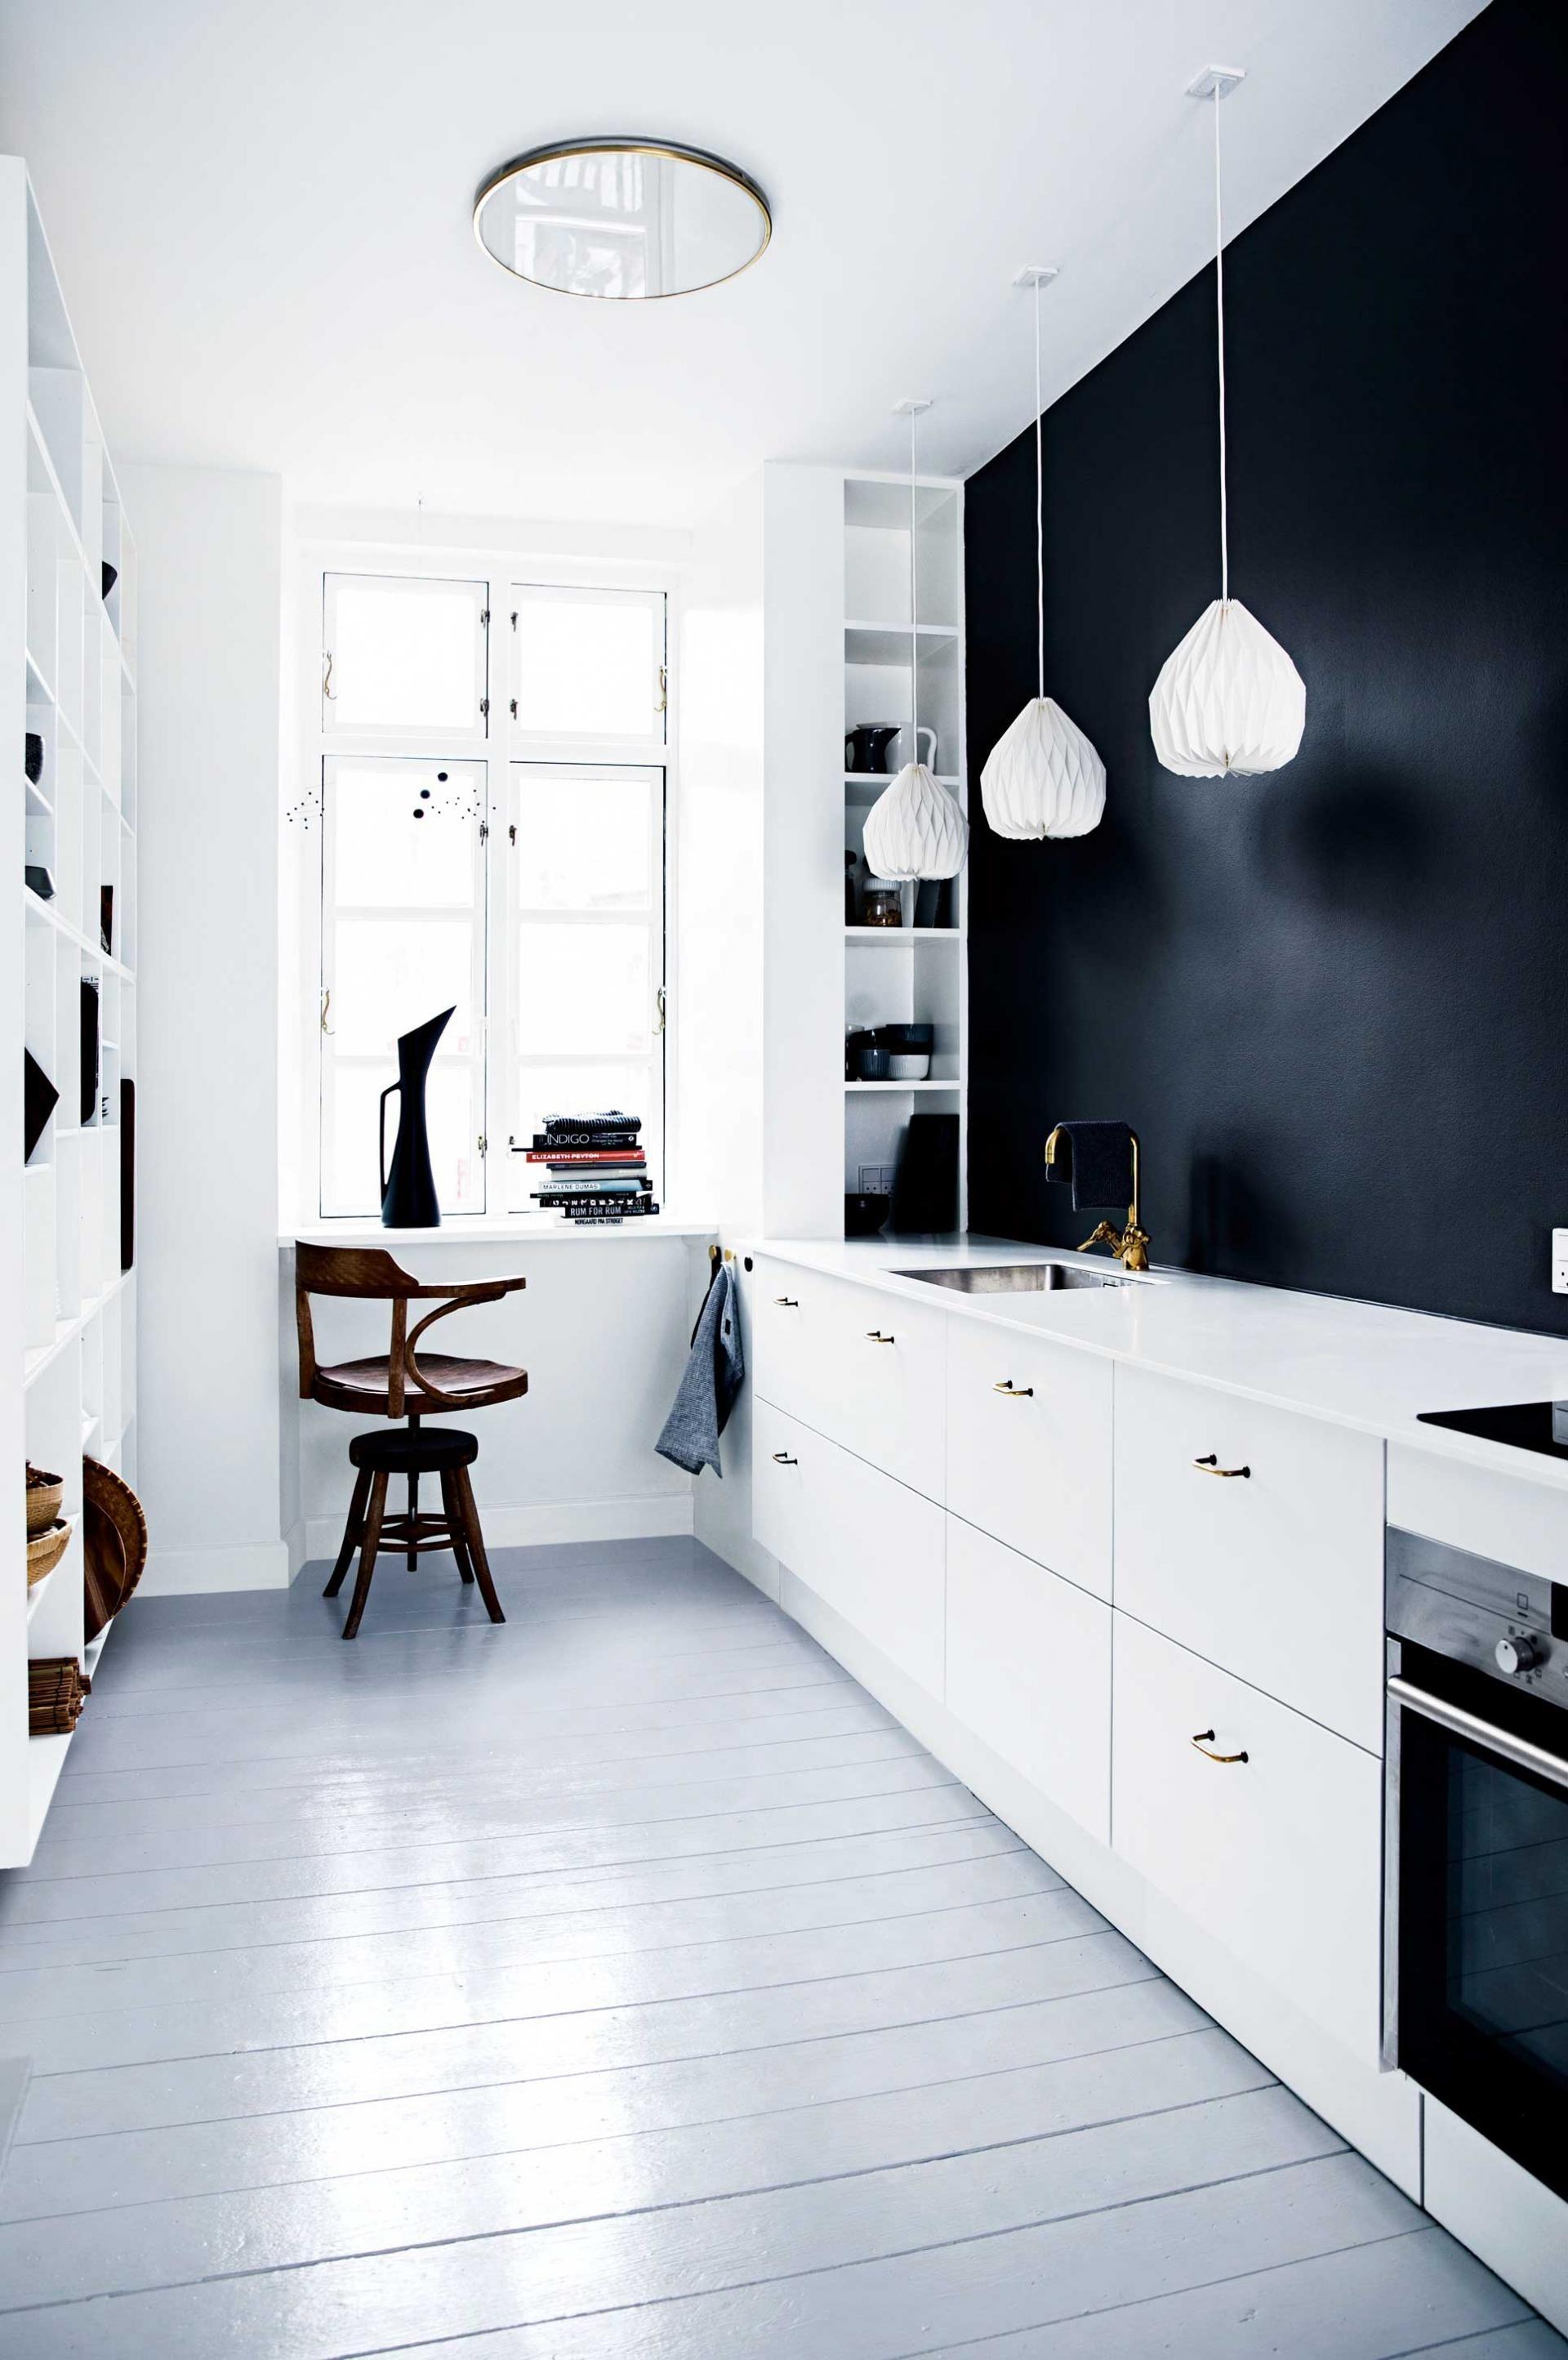 black and white minimalistic kitchen design pictures